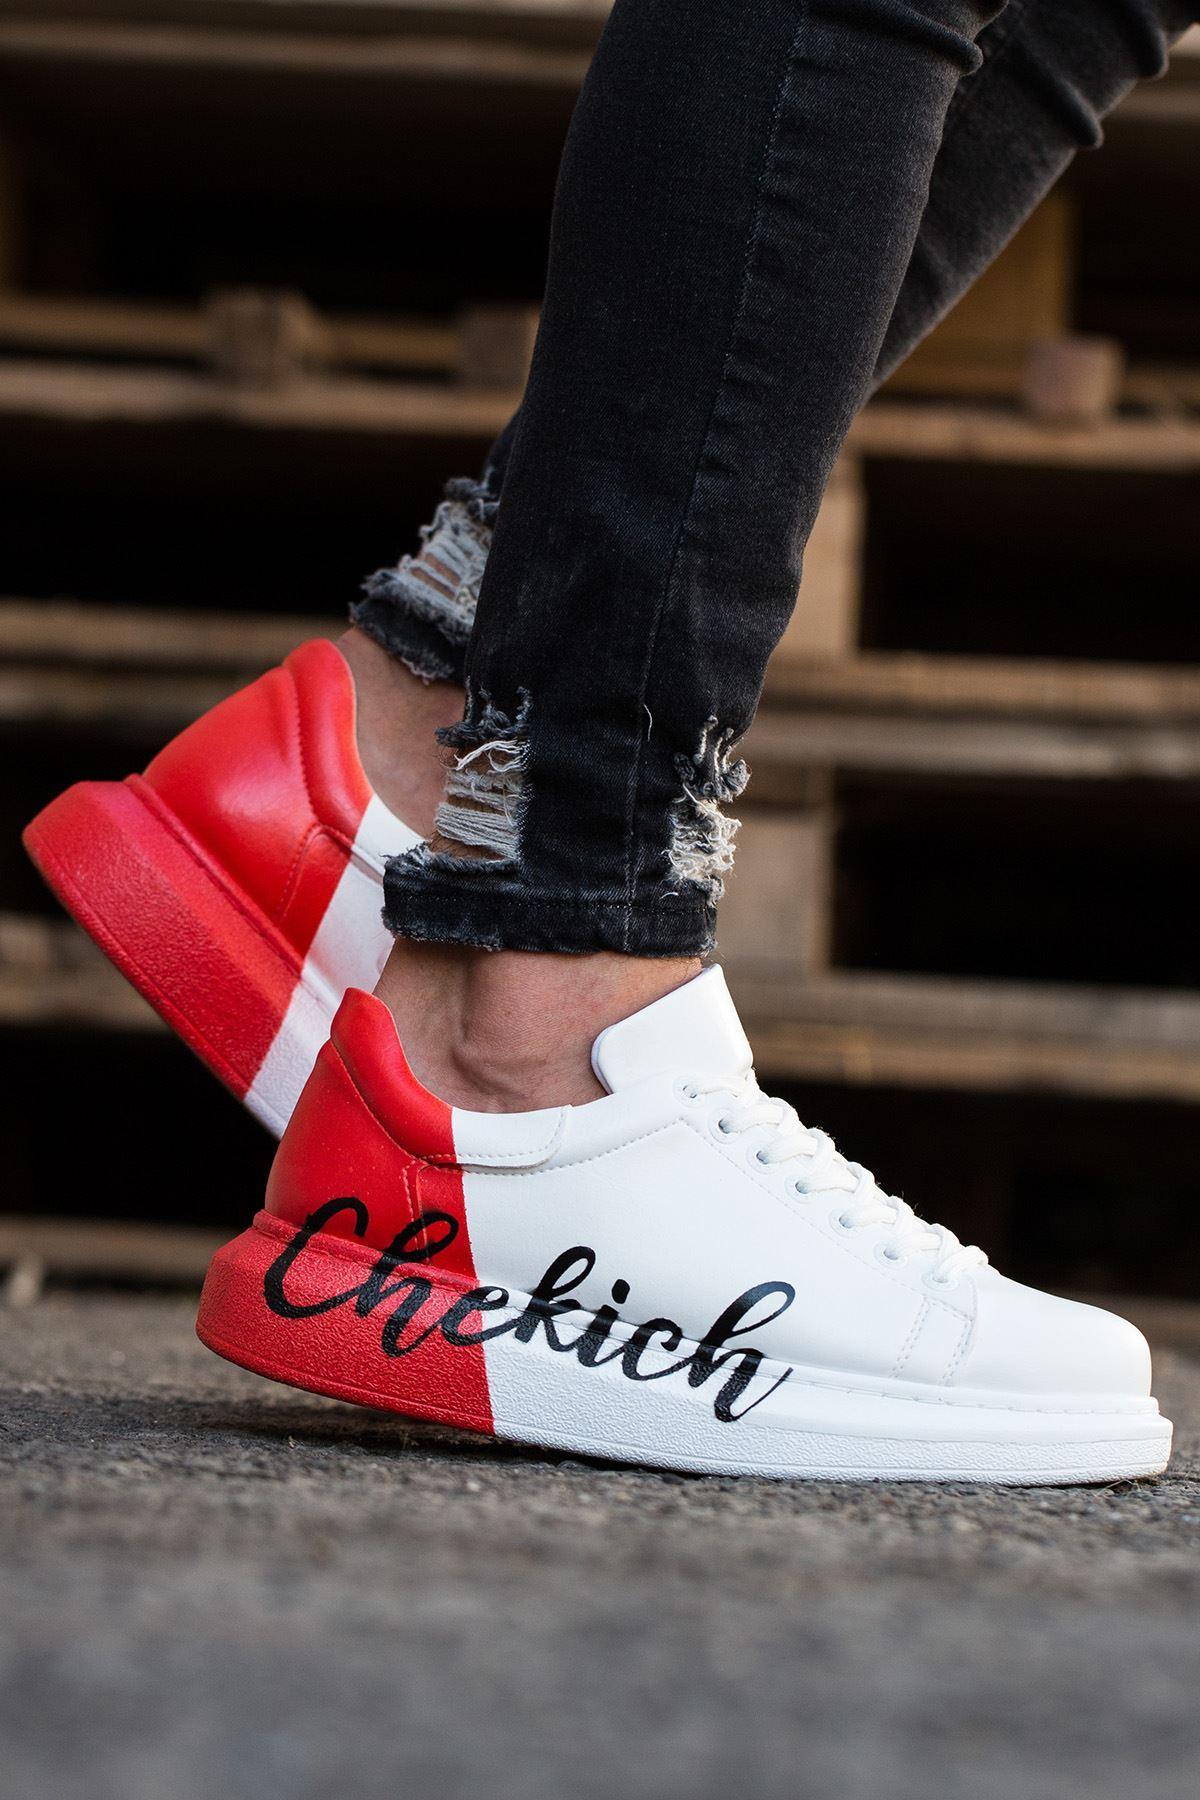 Chekich CH254 BT Erkek Ayakkabı 427 BEYAZ KIRMIZI CHEKICH